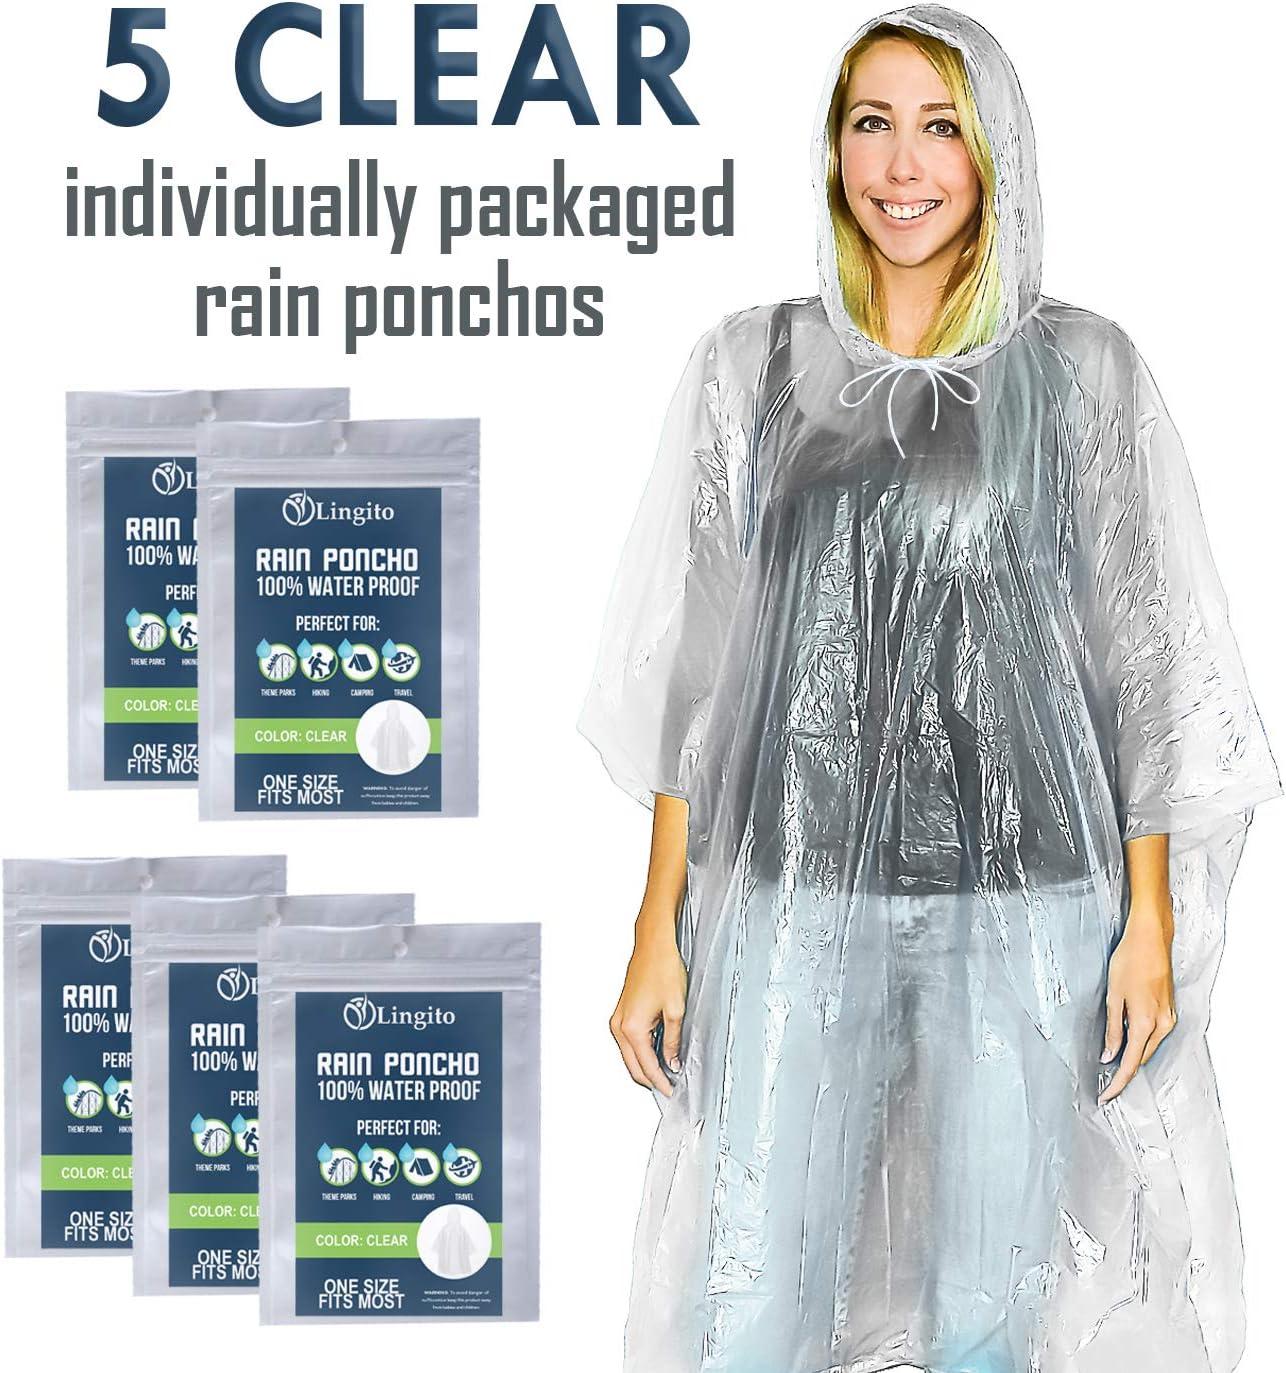 Lingito 15 Pack or 5 Pack Rain Poncho, Disposable Emergency Rain Ponchos